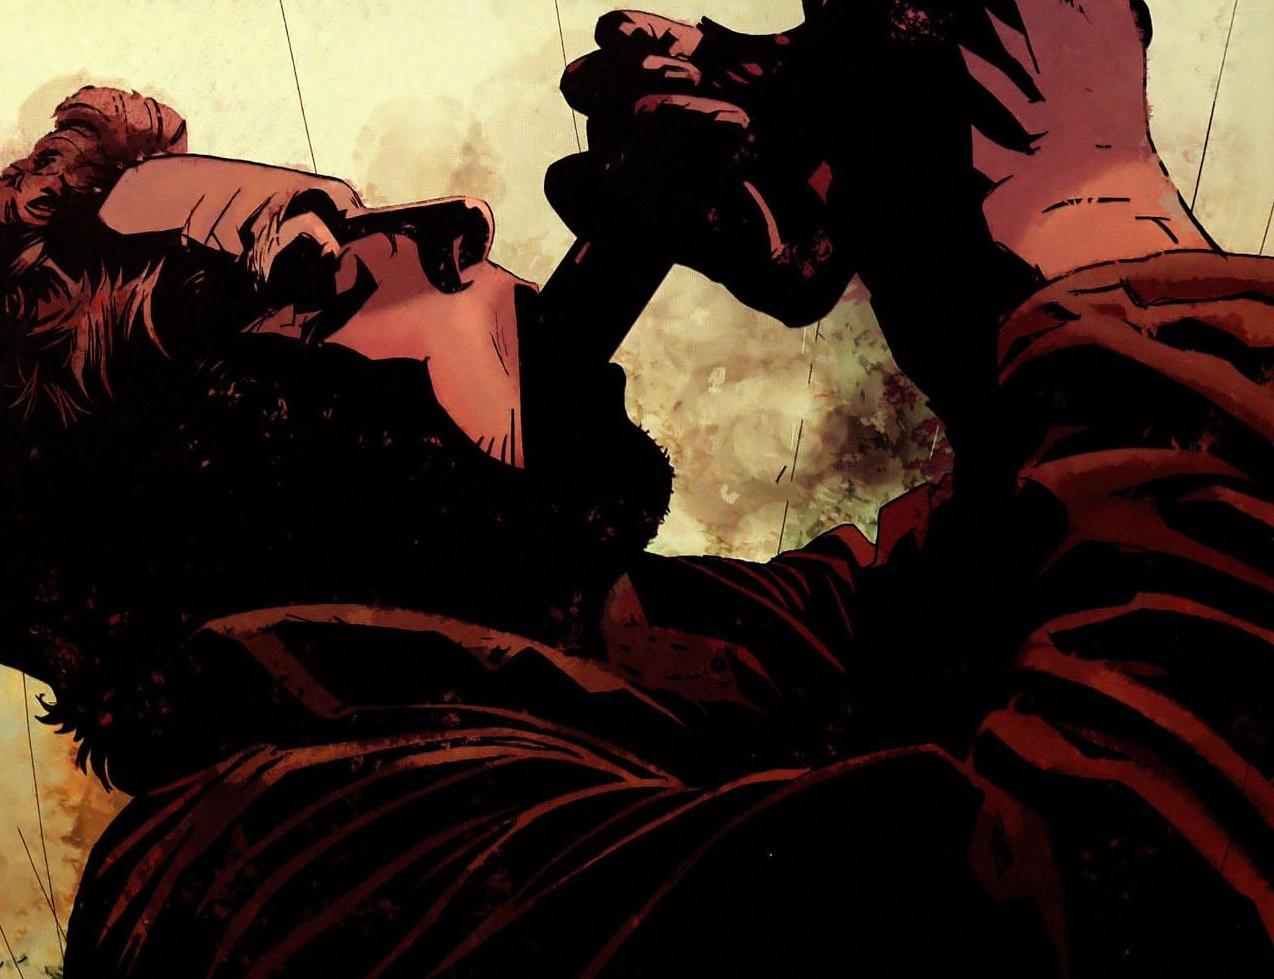 Robert Sanchez (Earth-616)